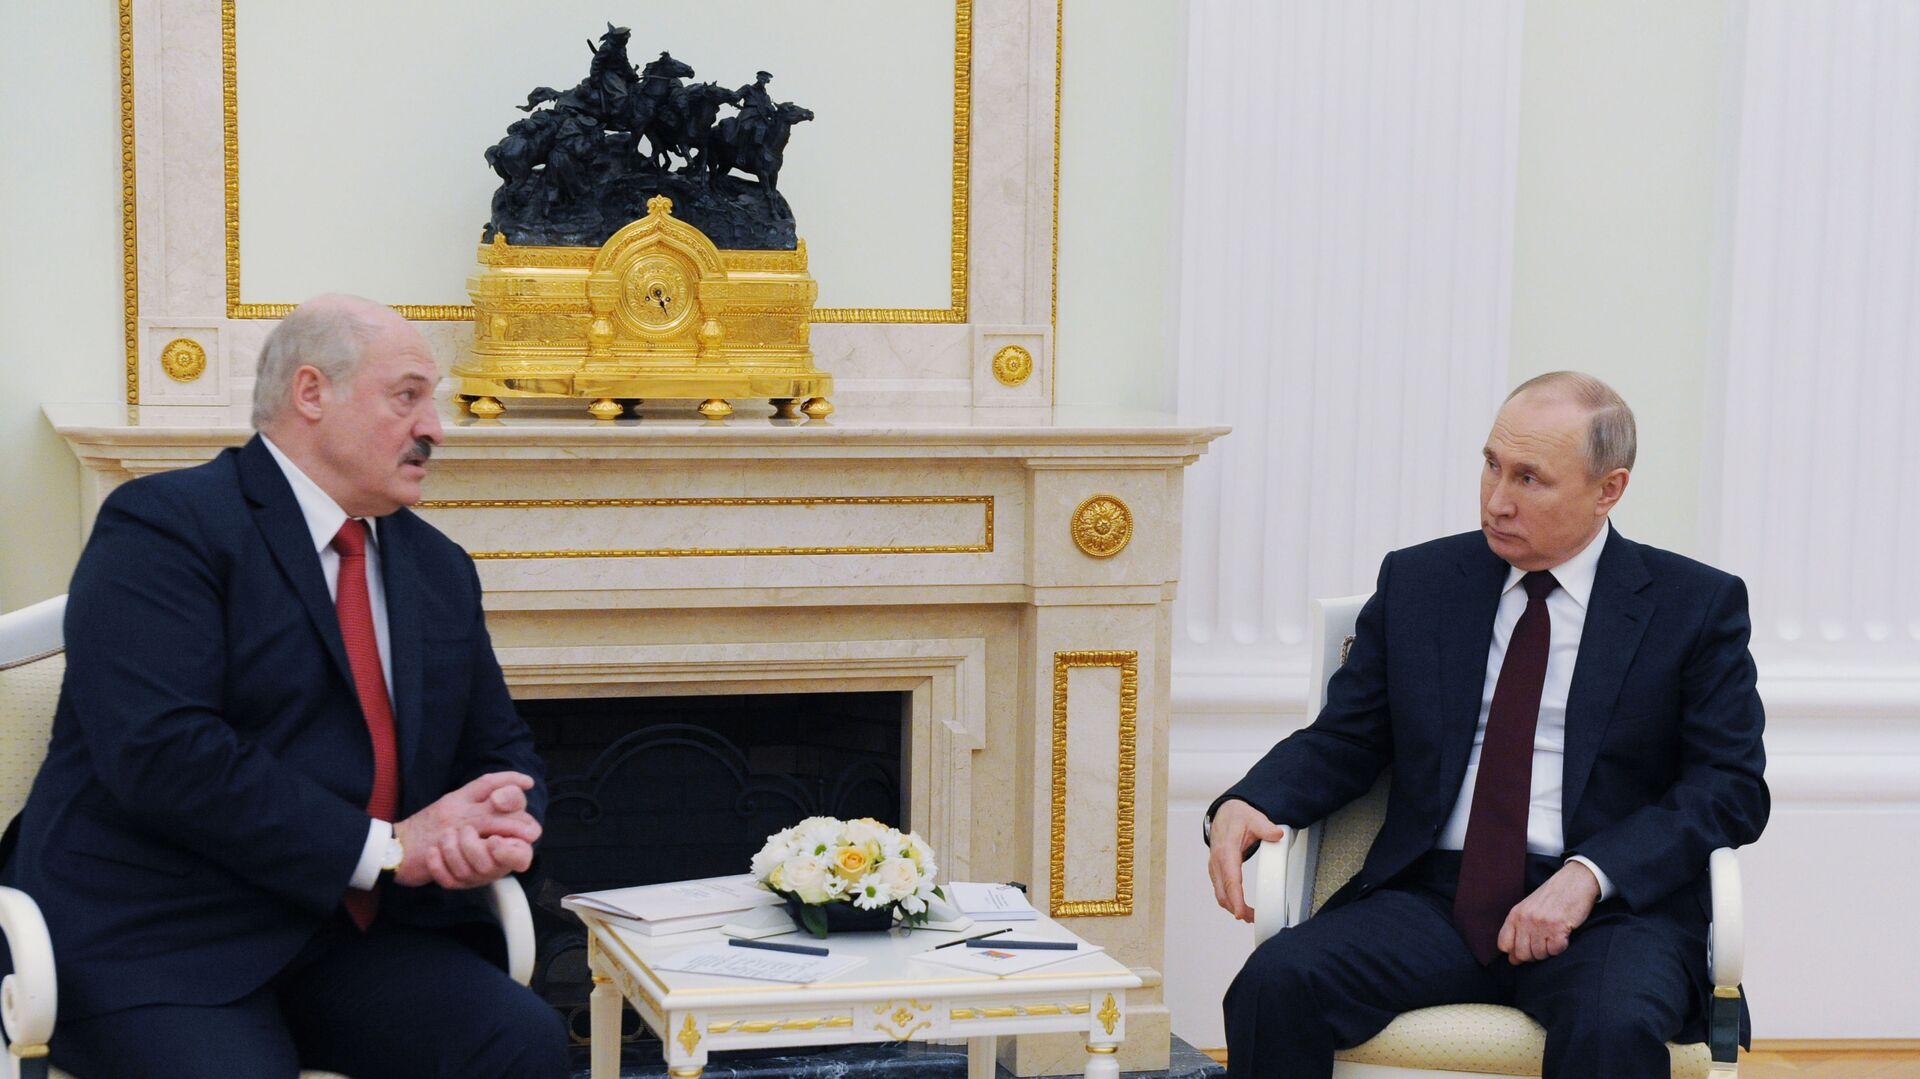 Prezydent Rosji Władimir Putin i prezydent Białorusi Alaksandr Łukaszenka - Sputnik Polska, 1920, 09.09.2021